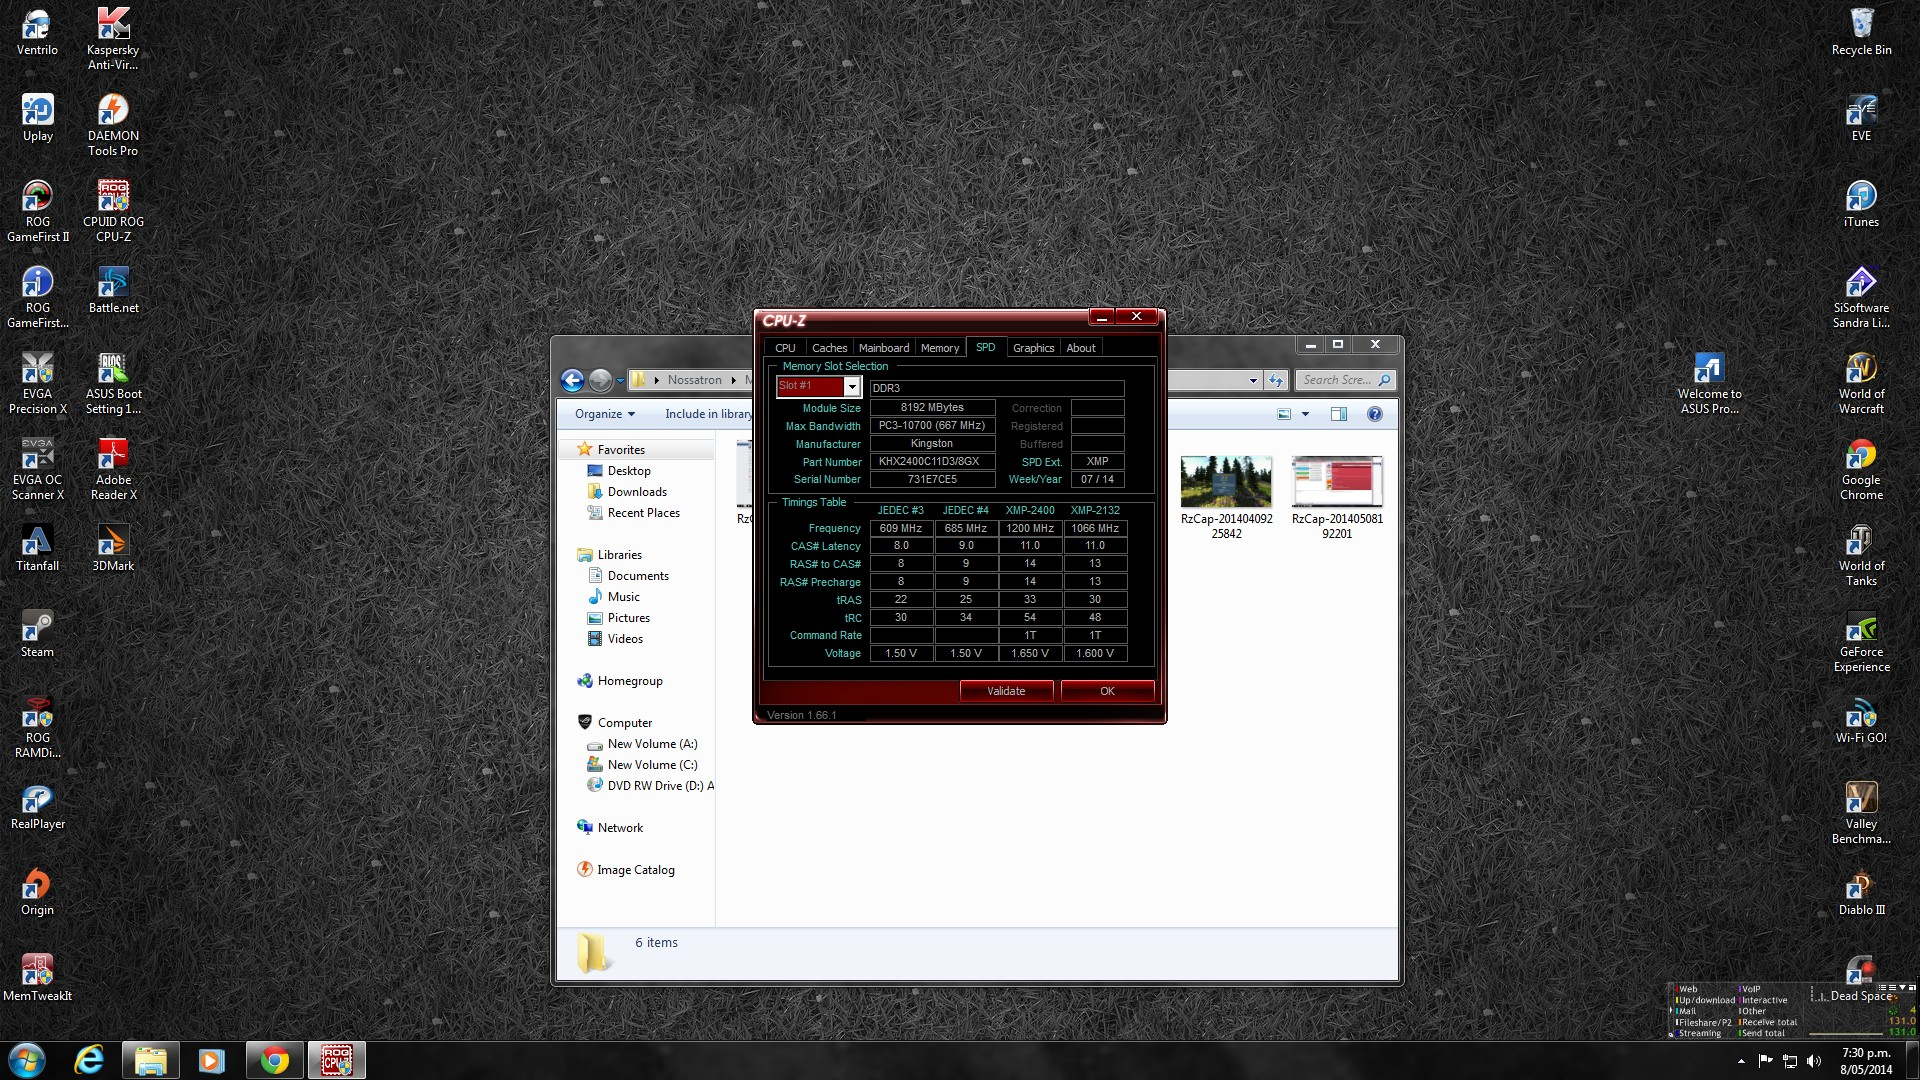 RzCap-20140508193021.jpg